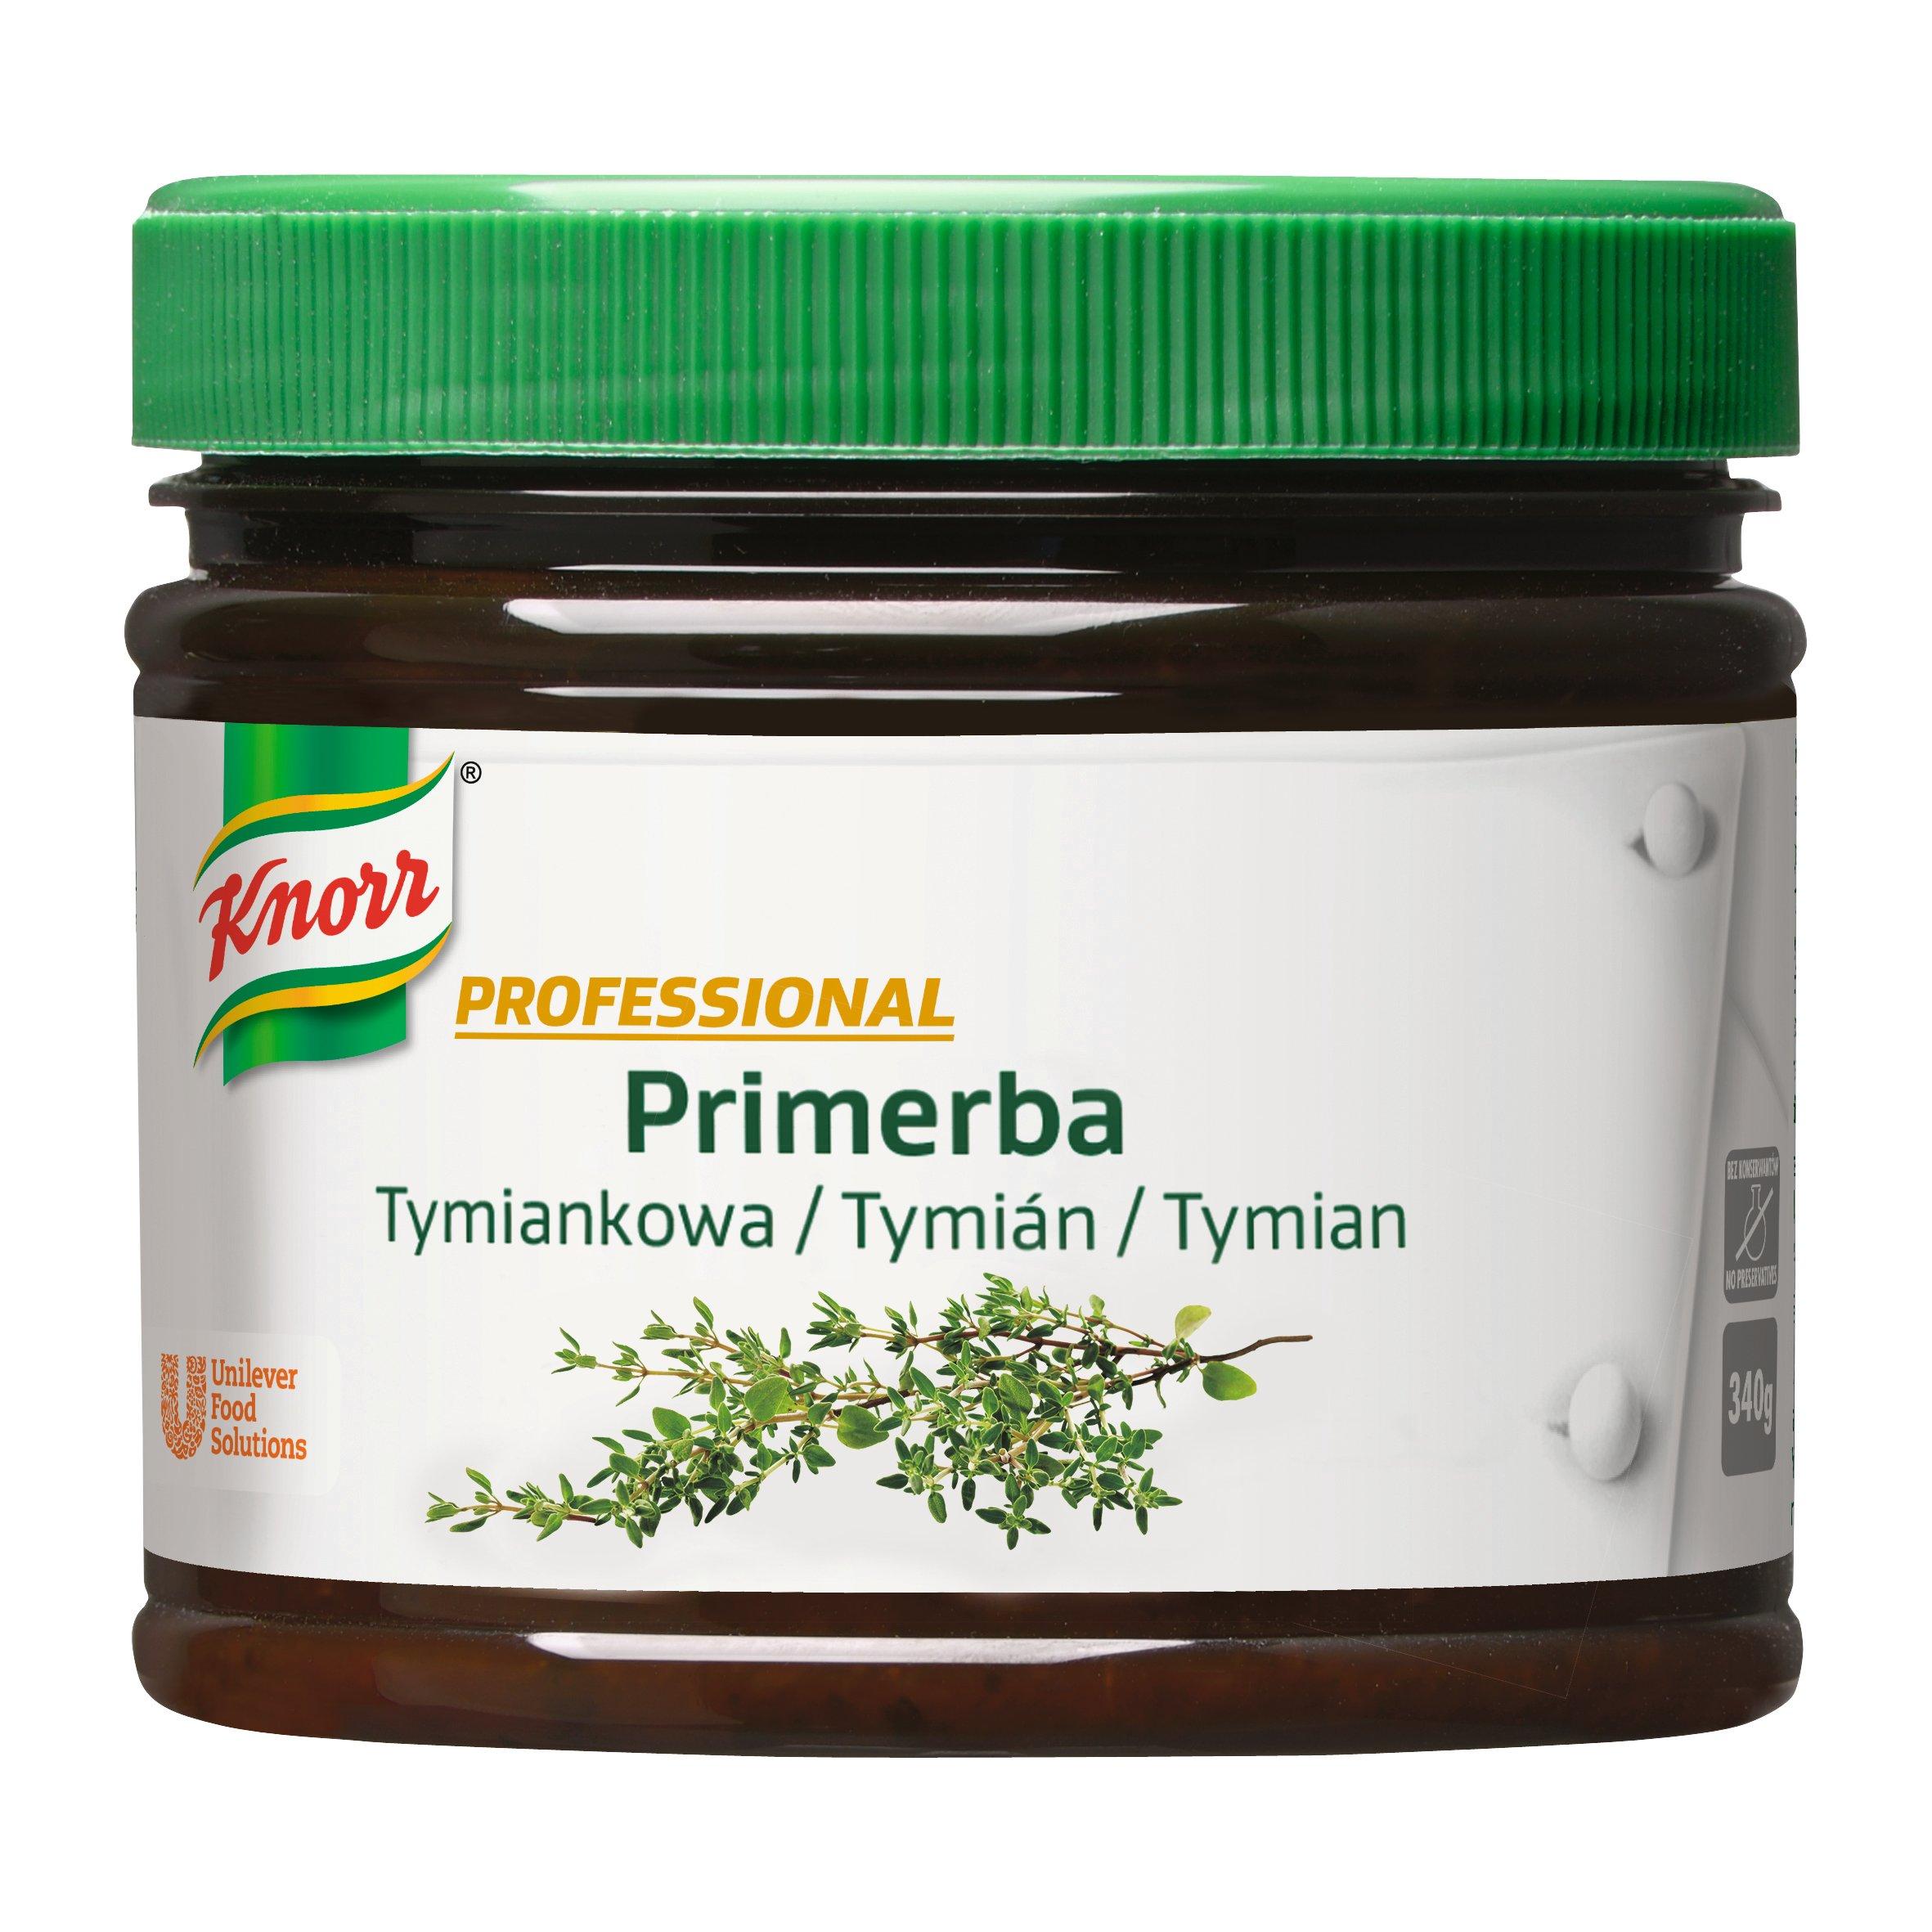 Knorr Professional Primerba Tymián 0,34 kg